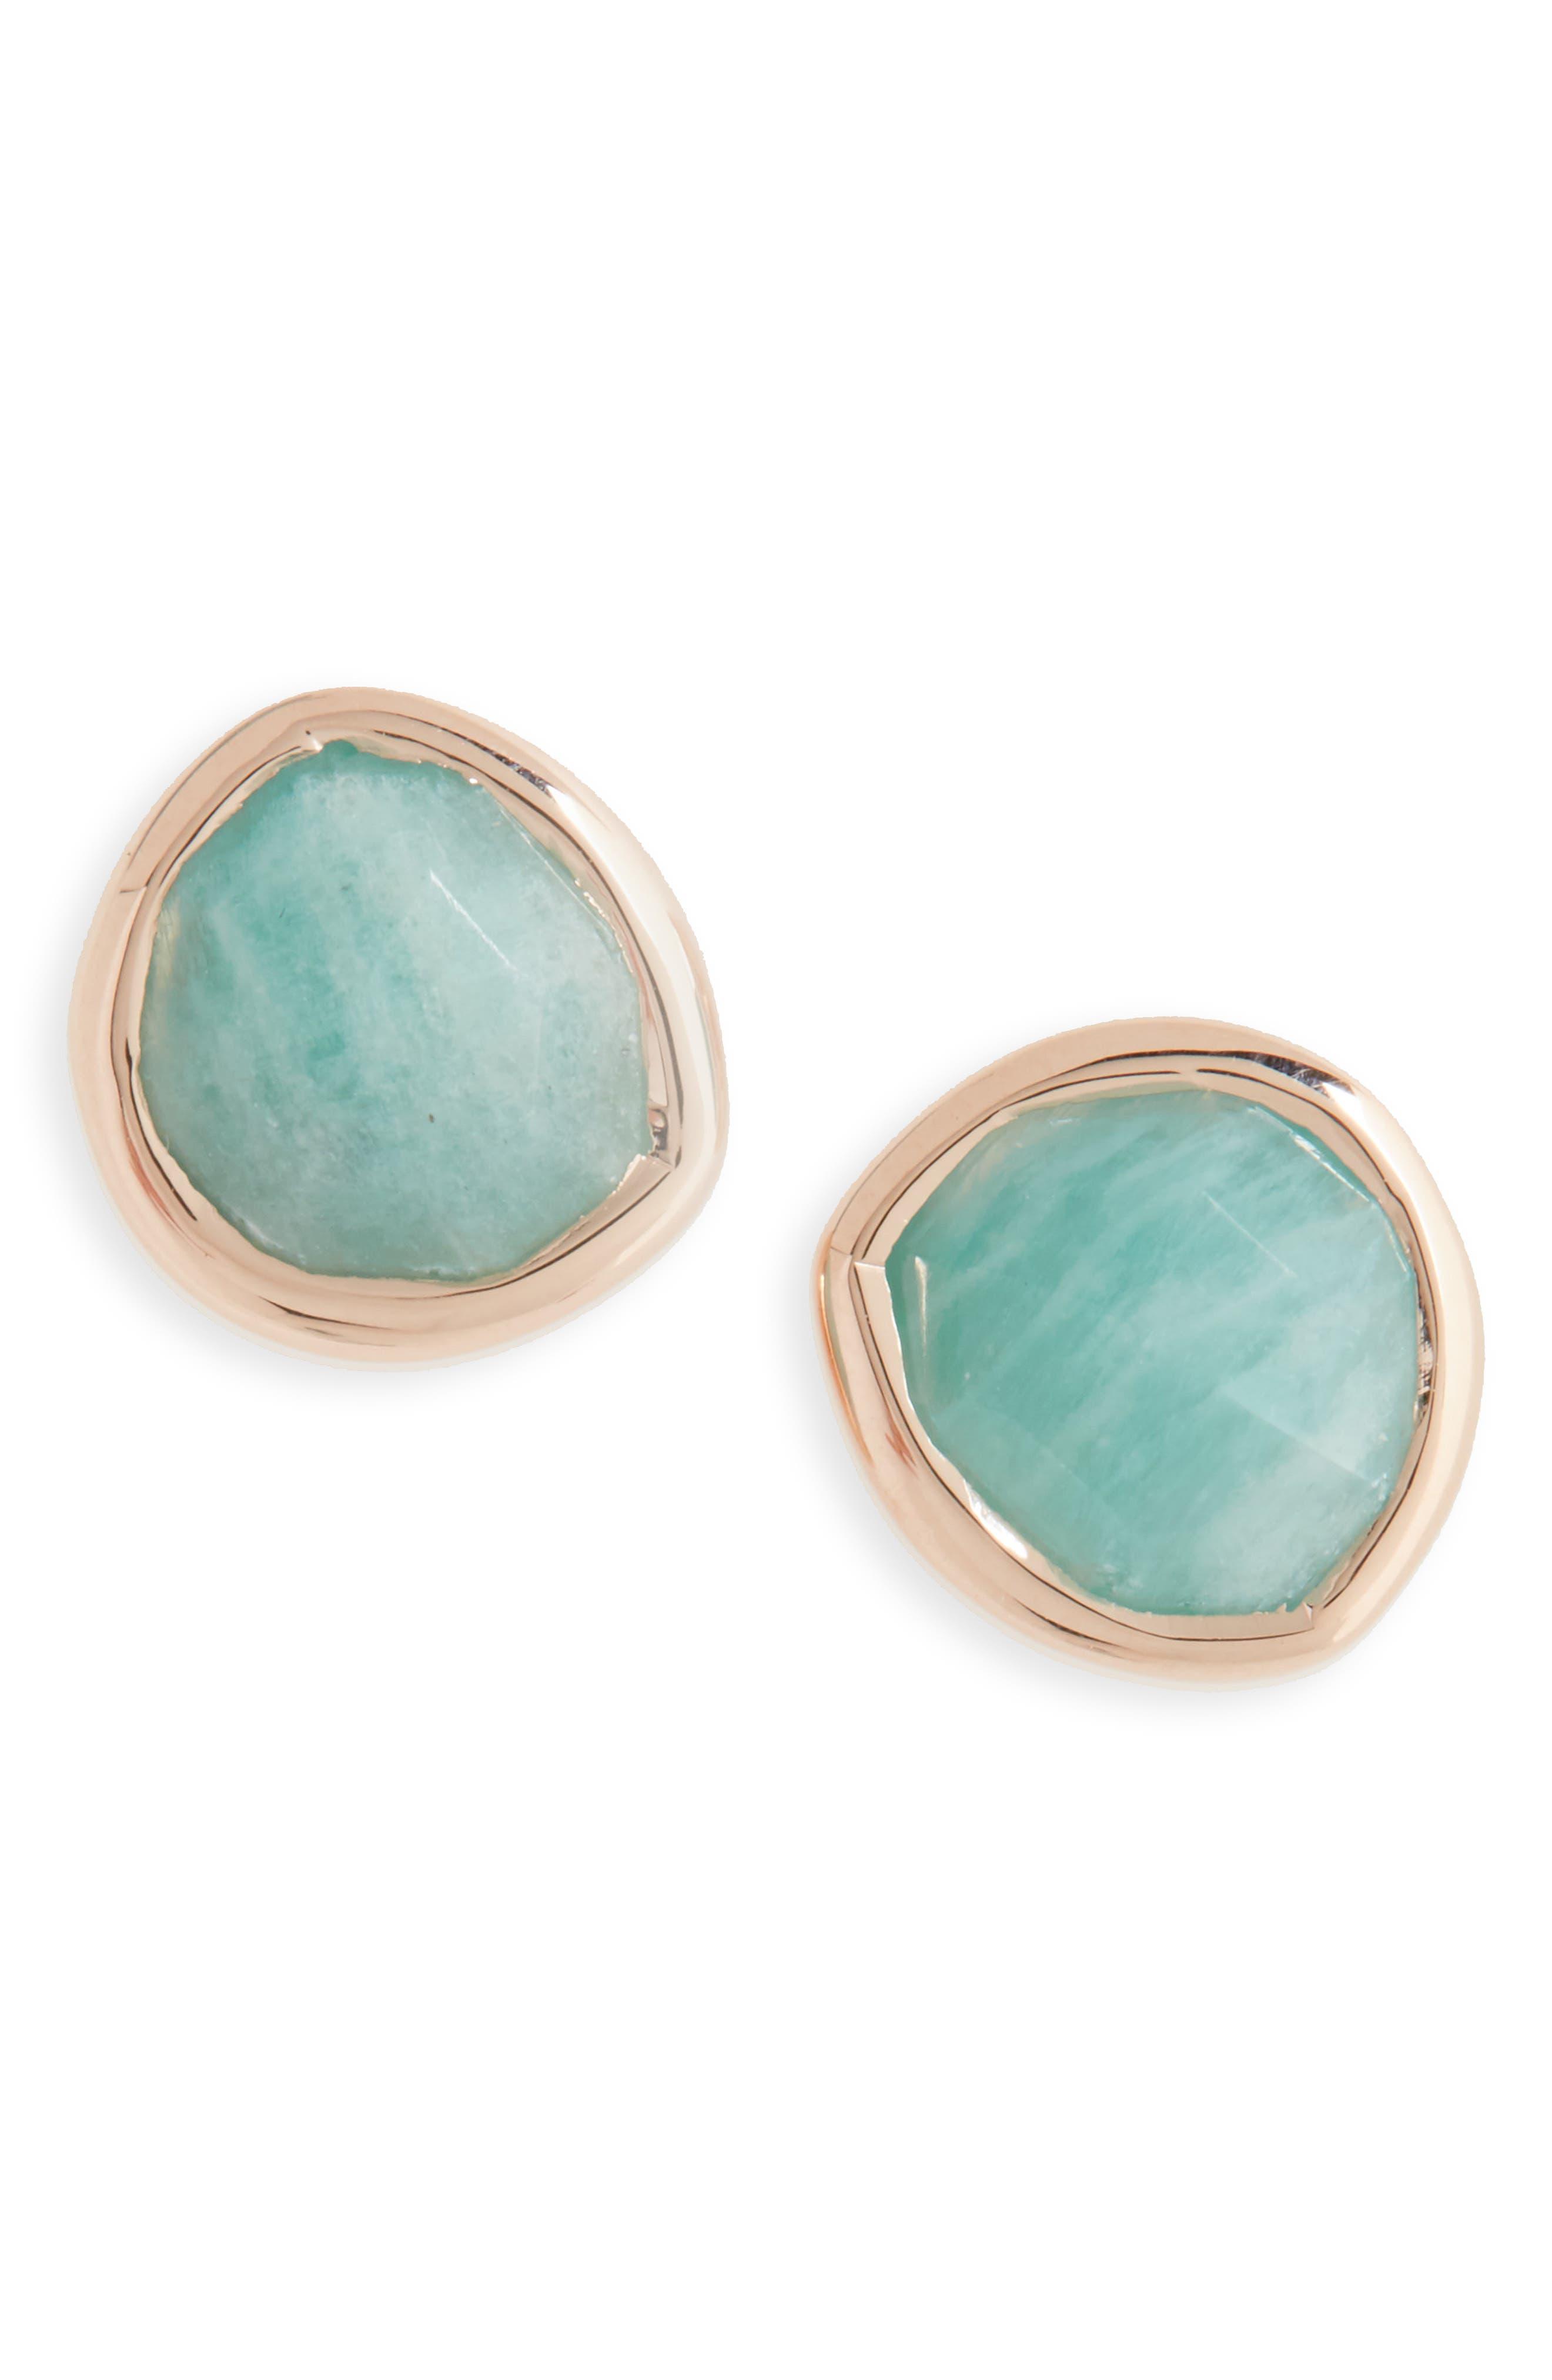 Main Image - Monica Vinader 'Siren' Semiprecious Stone Stud Earrings (Nordstrom Exclusive)